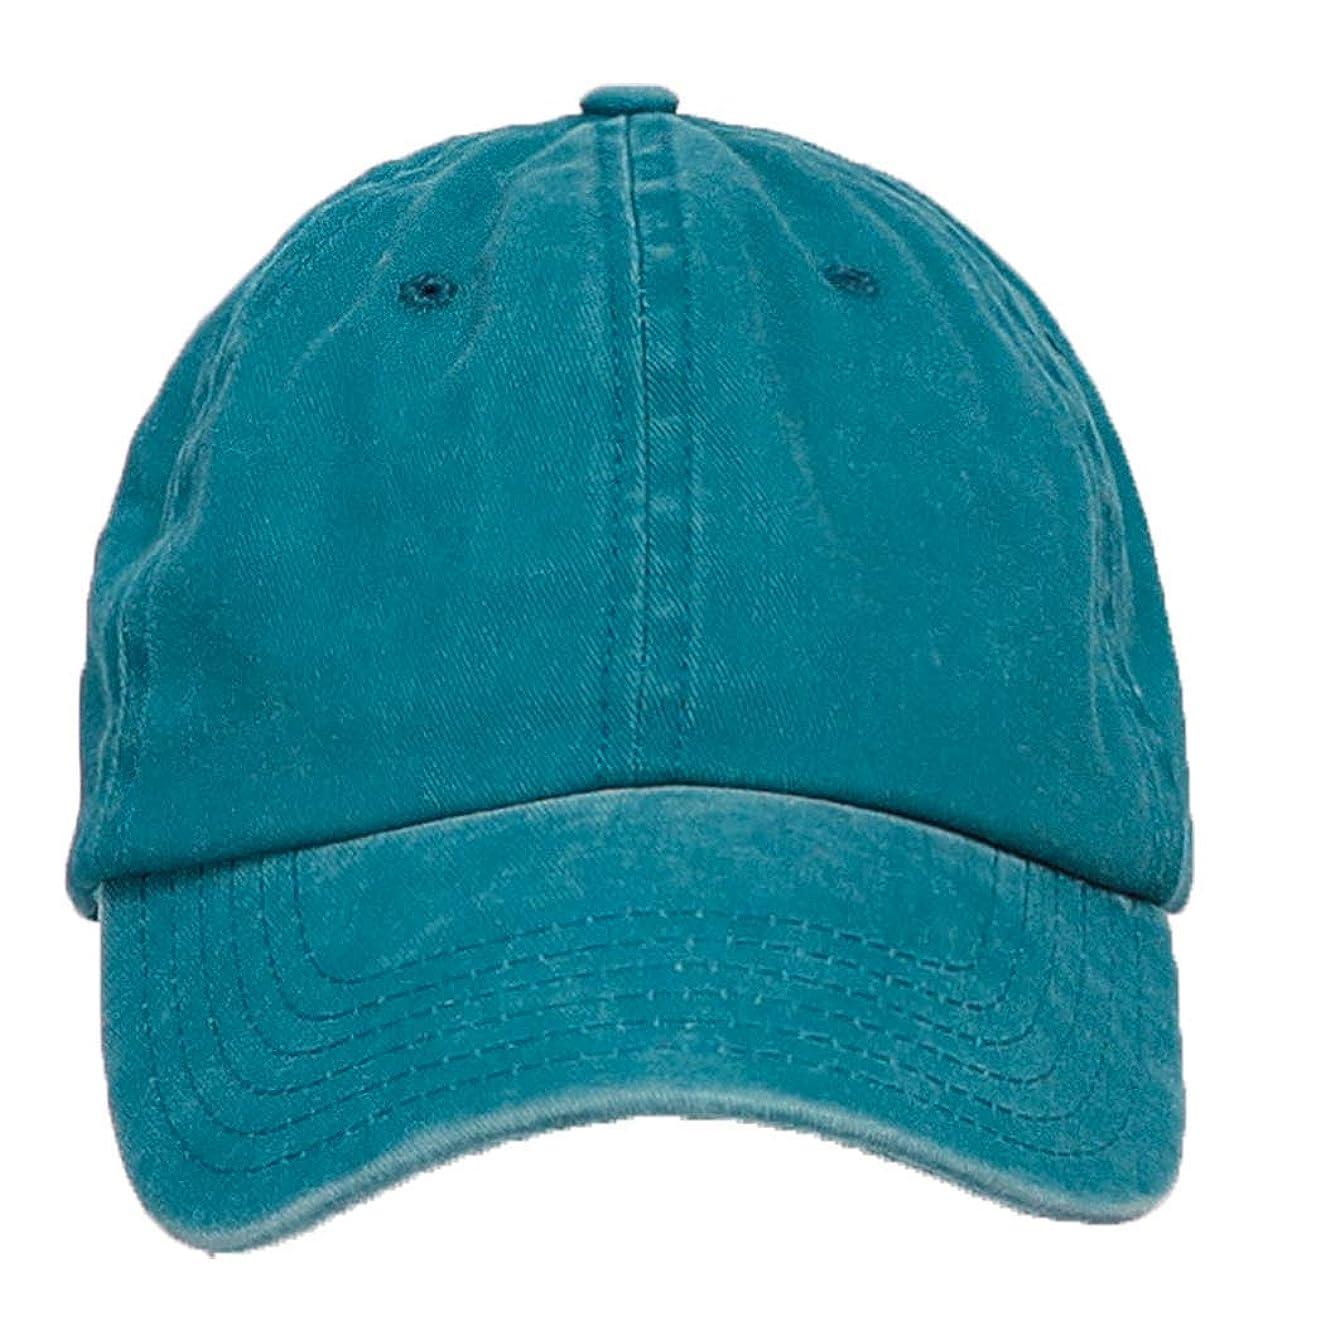 ed686837837a2f Azure Hat 12-Pack Wholesale Unisex Pigment Dye Washed Cotton Men Women  Adjustable Baseball Cap